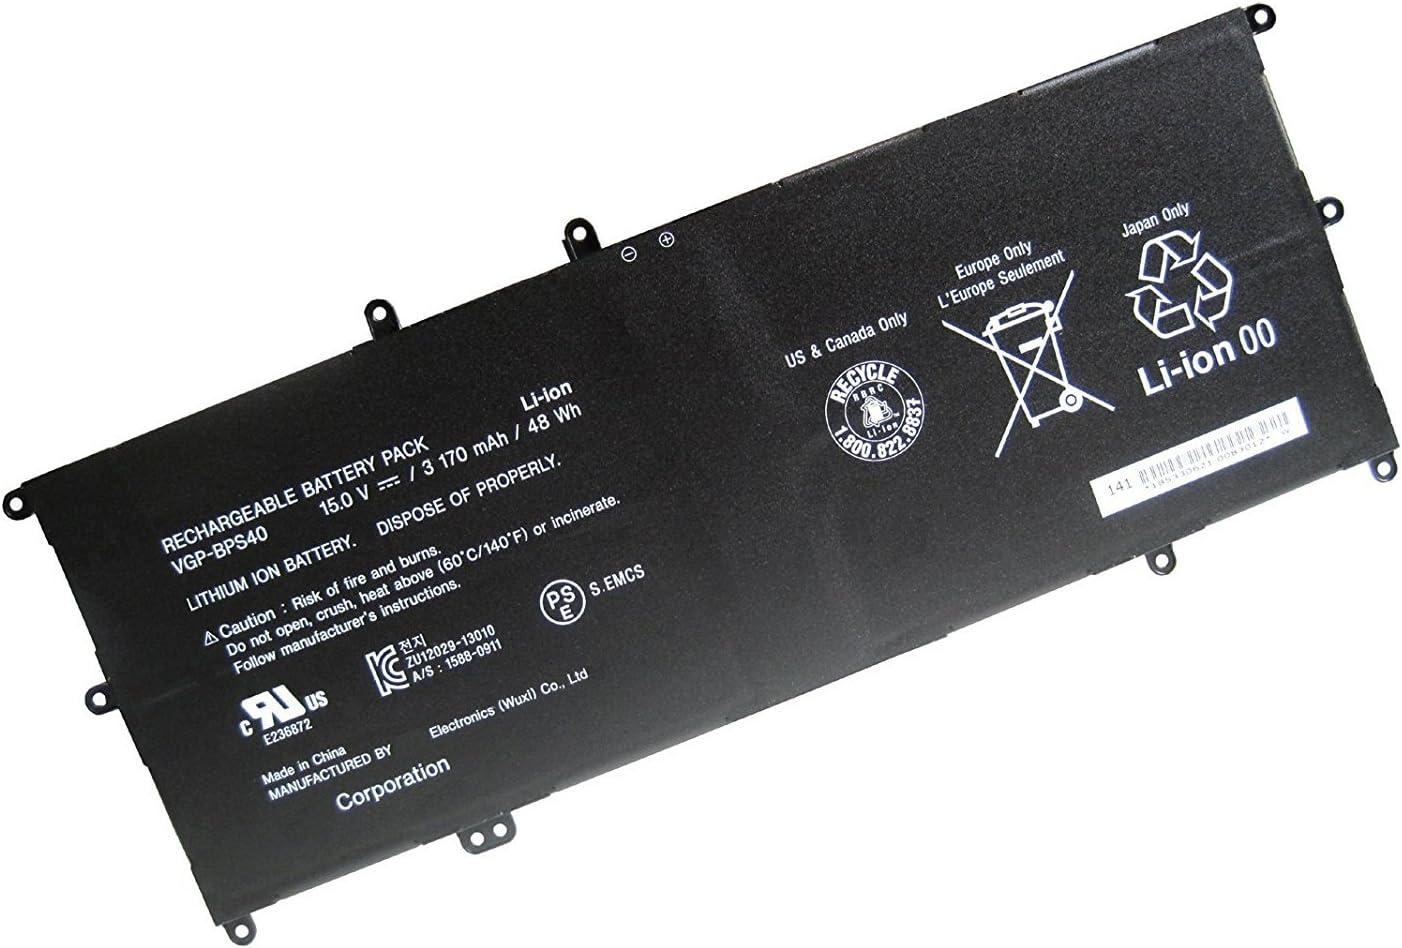 Batterymarket 15.0V 48WH 3170MAH VGP-BPS40 Battery Compatible with Sony Vaio Flip SVF 15A SVF15N17CXB SVF15NB1GL SVF15NB1GU SVF15NA1GL SVF15NA1GU SVF15N18PXB SVF15N26CXB SVF15N28PXB SVF15N23CGS